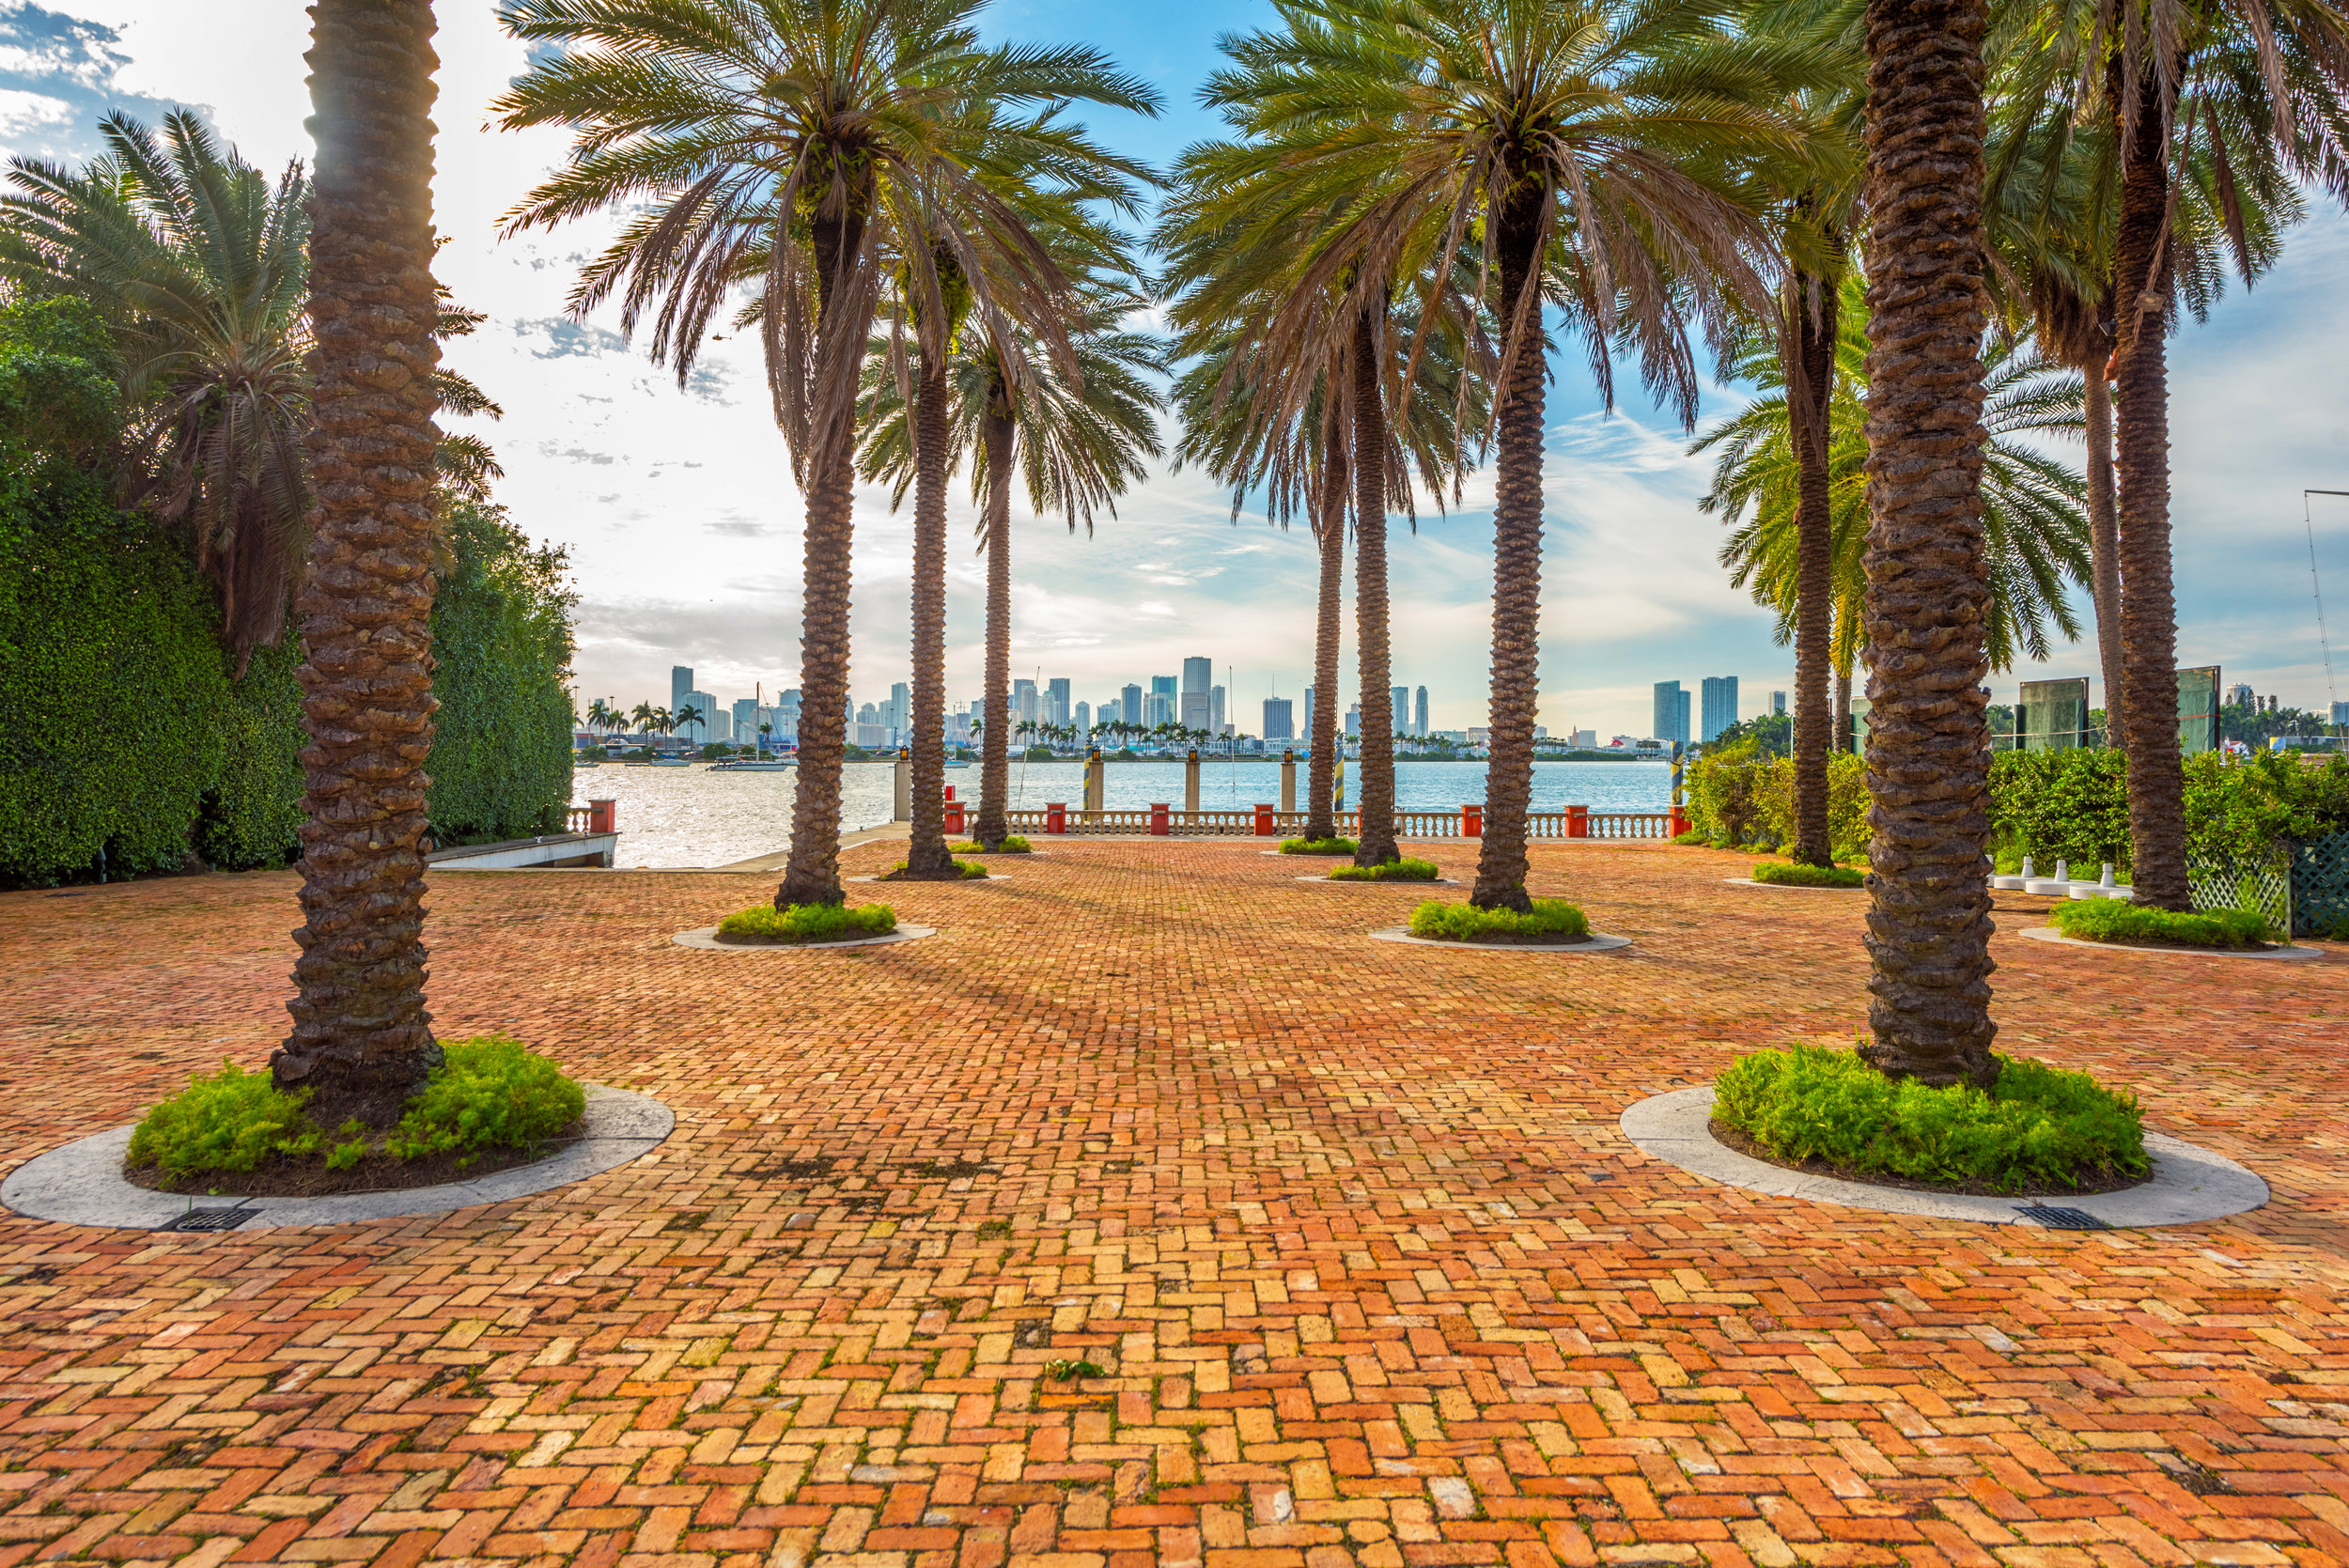 Lennar Executive Chairman Stuart Miller Expands Star Island Holdings After Acquiring Thomas Kramer's Former Estate 5 Star Island For $33 Million